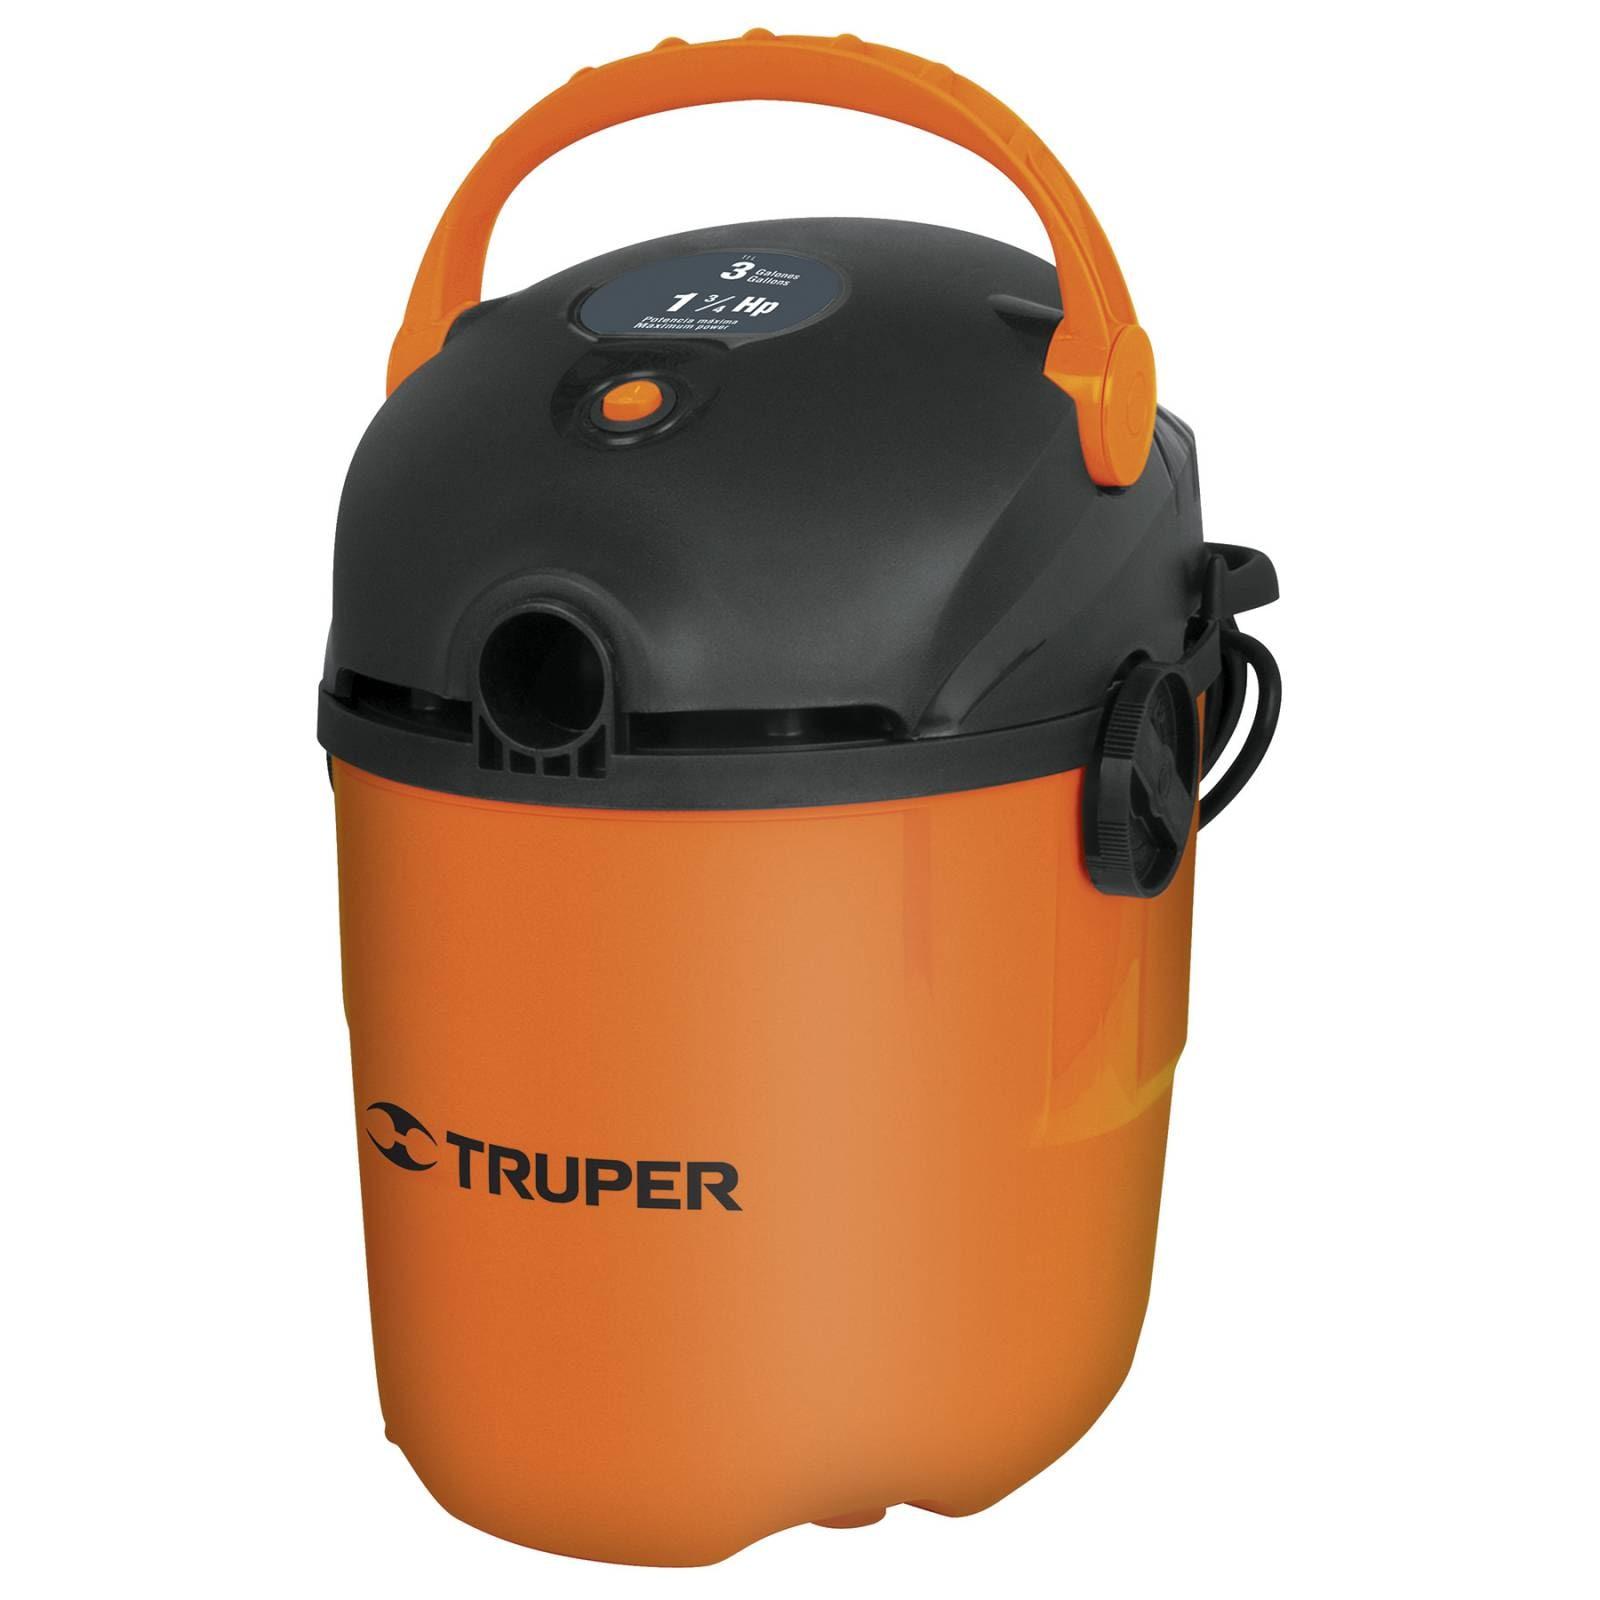 Aspiradora de 3 galones Truper 12091